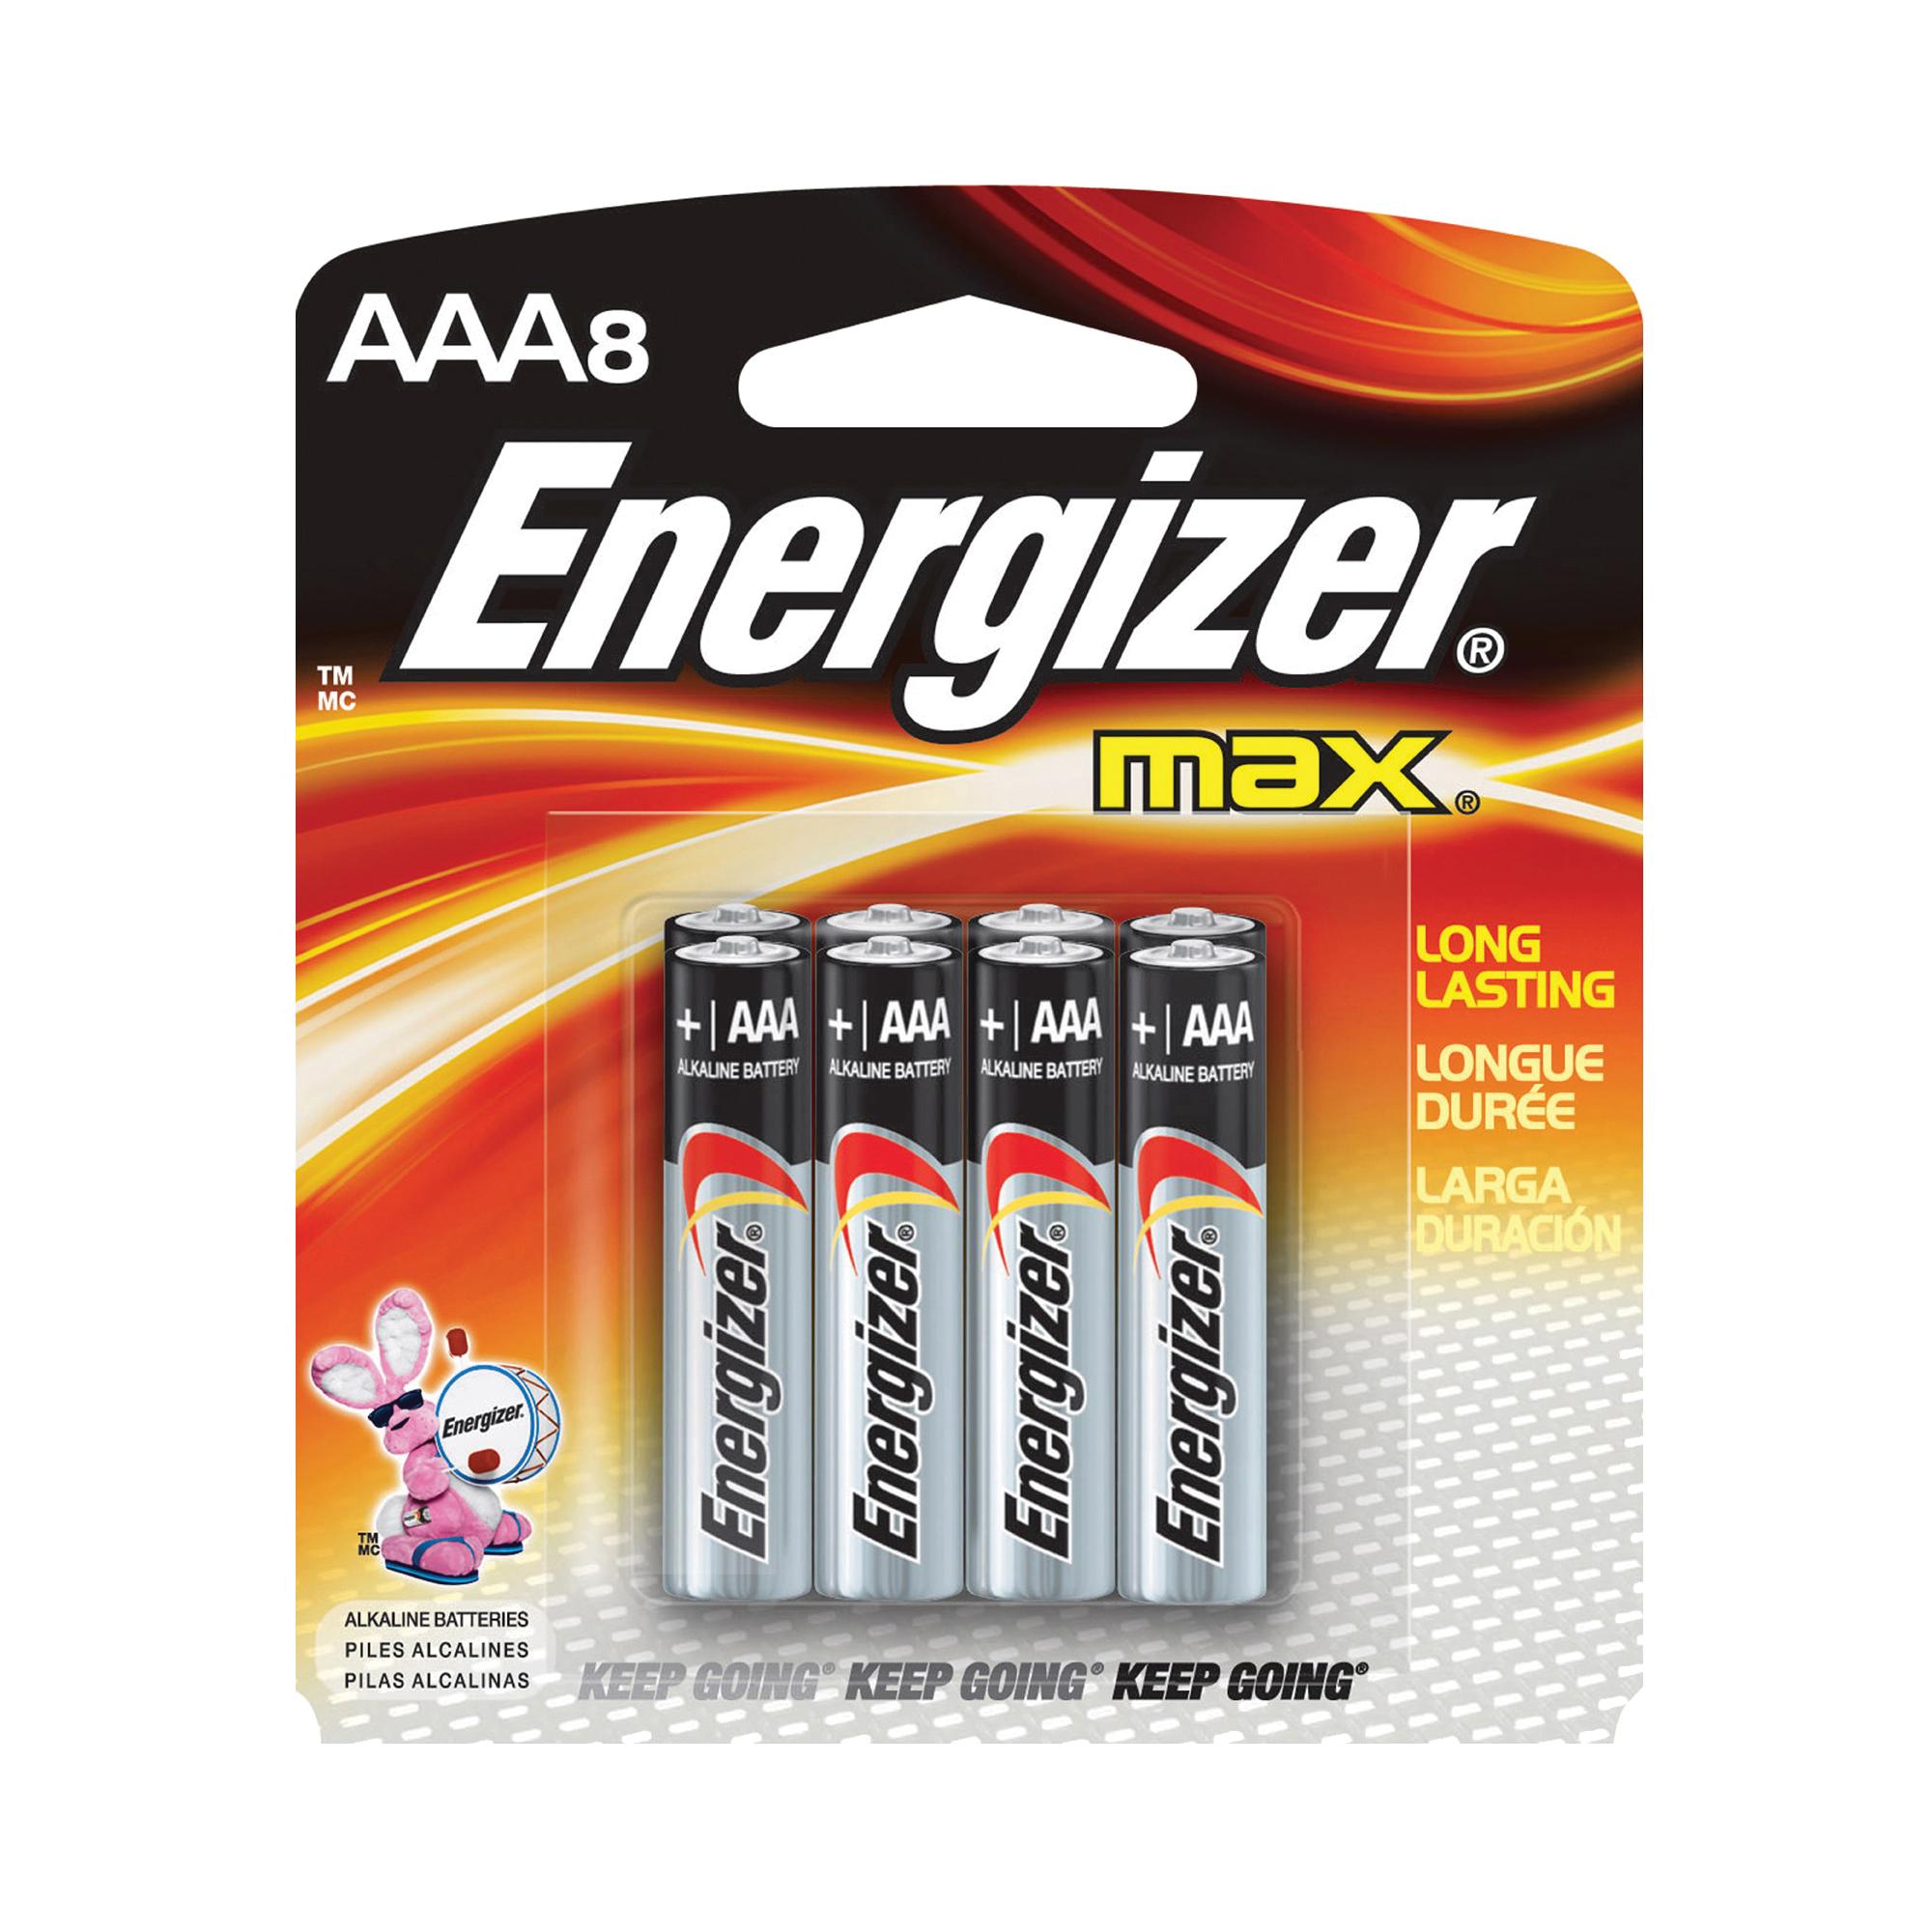 Picture of Energizer E92MP-8 Alkaline Battery, 1.5 V Battery, 1250 mAh, AAA Battery, Zinc, Manganese Dioxide, 8/PK